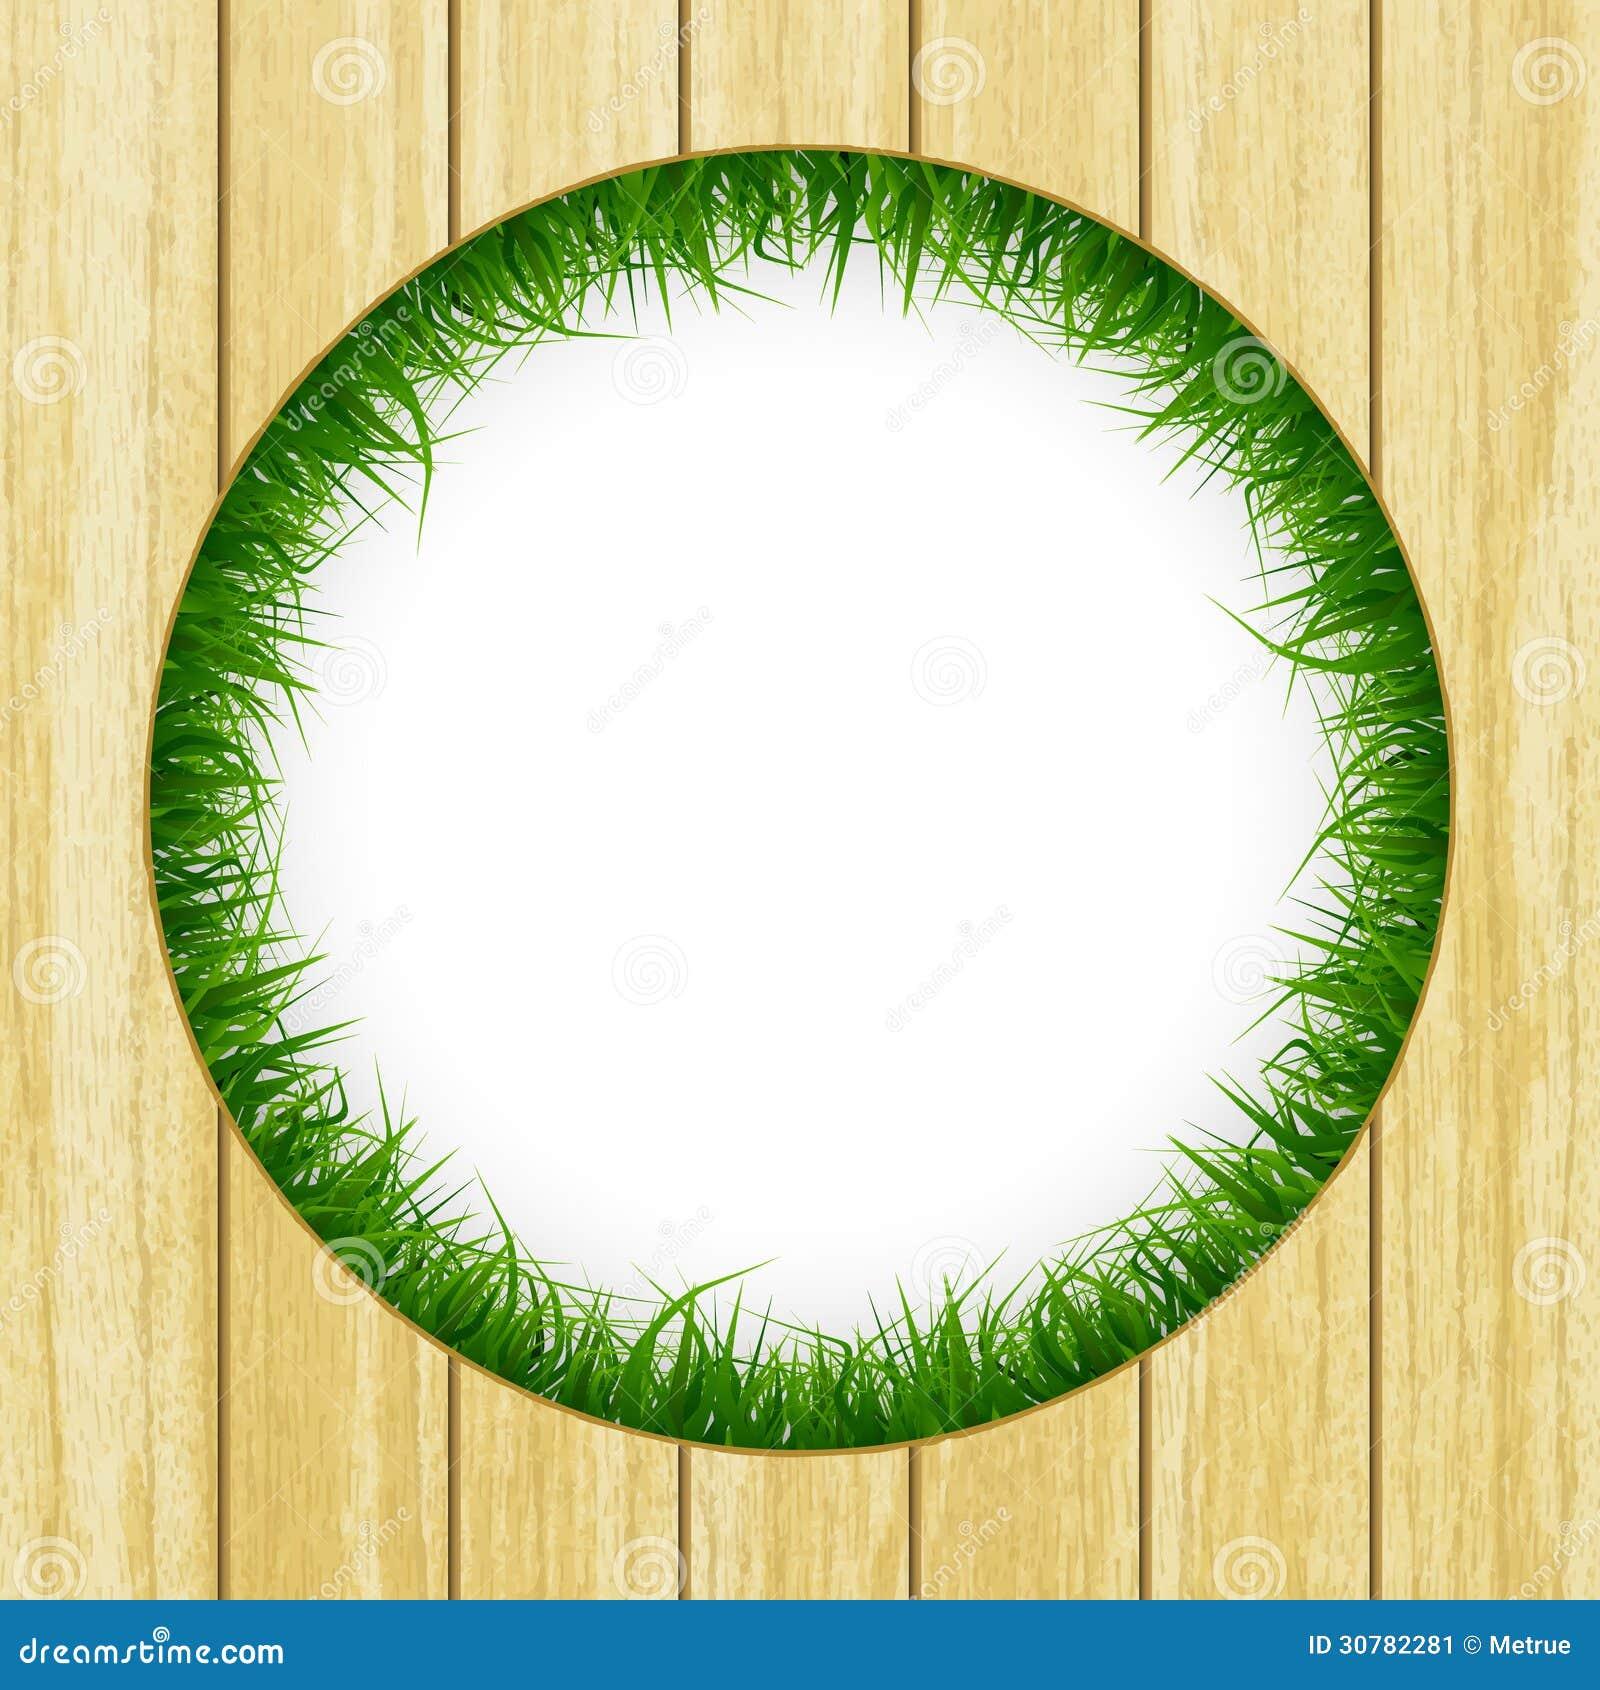 Set Of Yoga And Spa Logo Vector: Grass Circle Stock Vector . Illustration Of Grass, Design